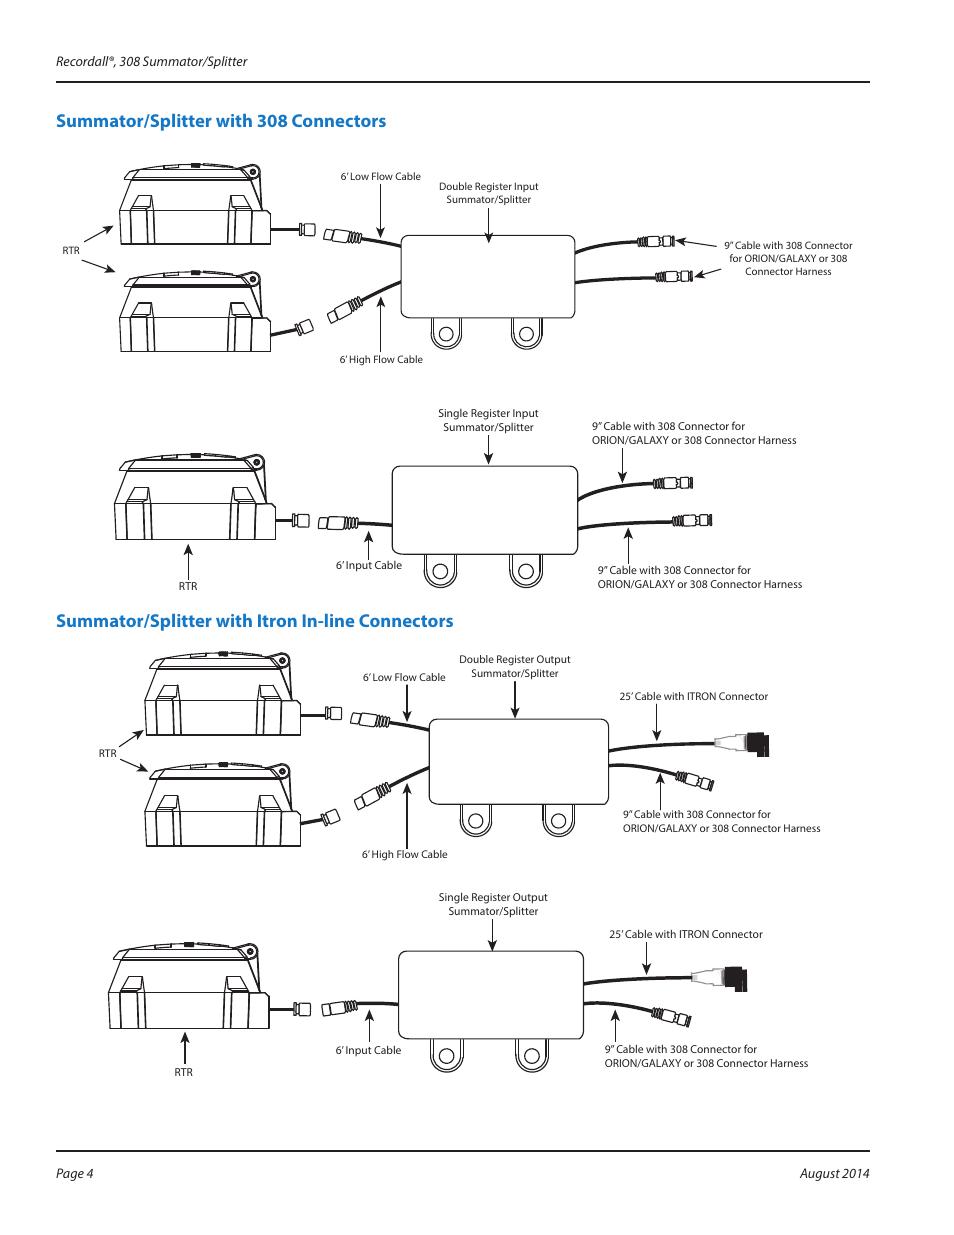 medium resolution of summator splitter with 308 connectors summator splitter with itron in line connectors